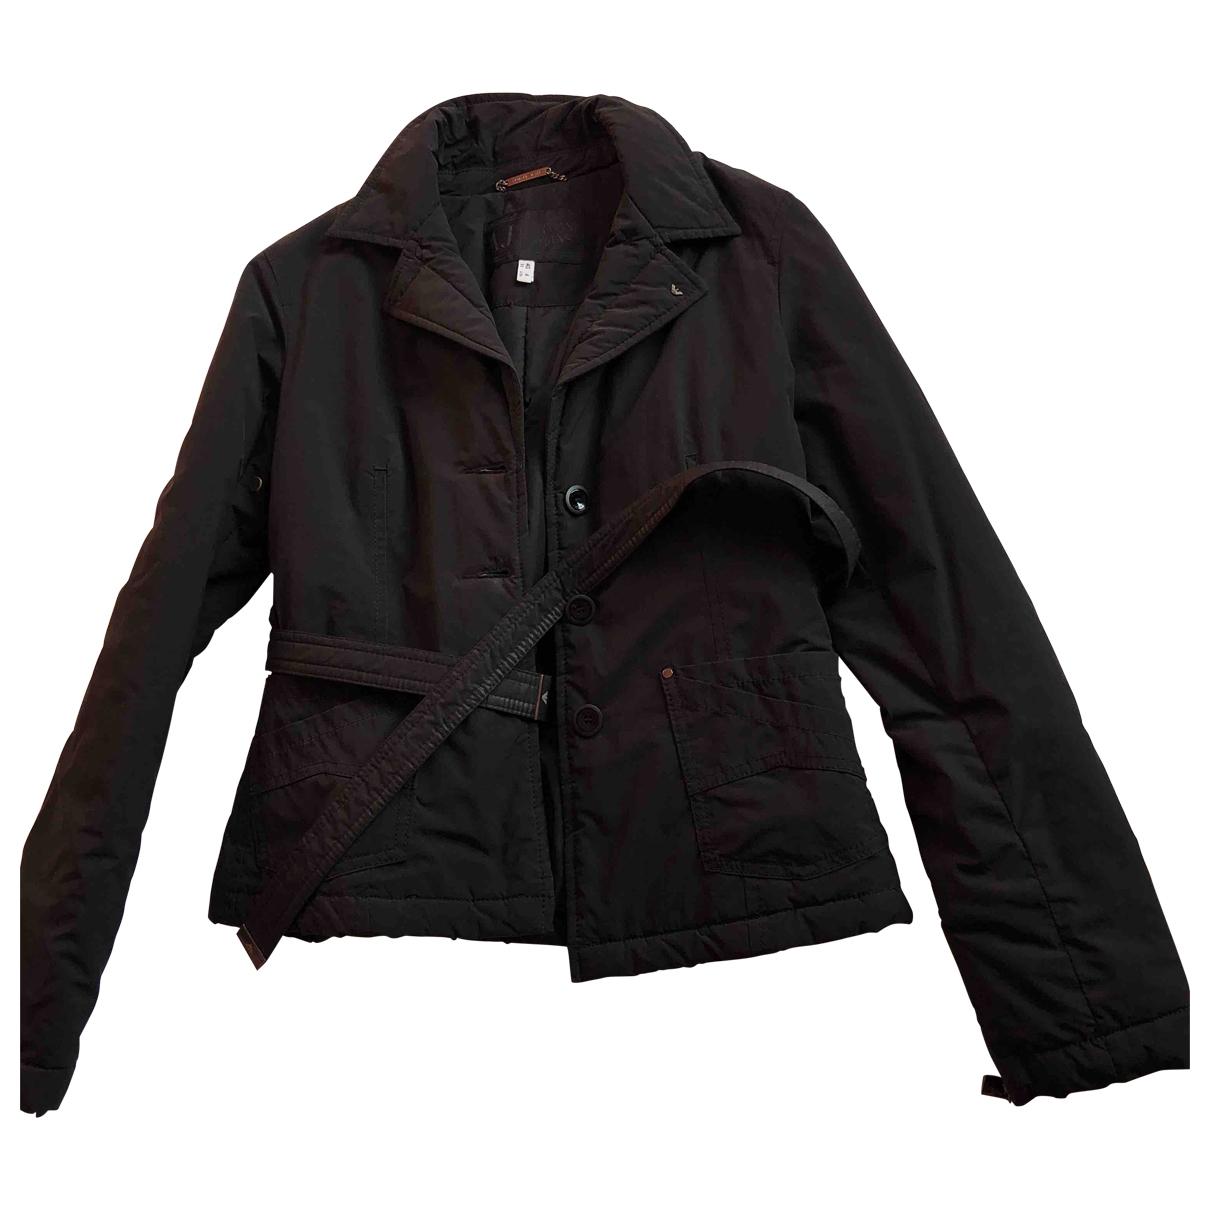 Armani Jeans \N Jacke in  Schwarz Polyester